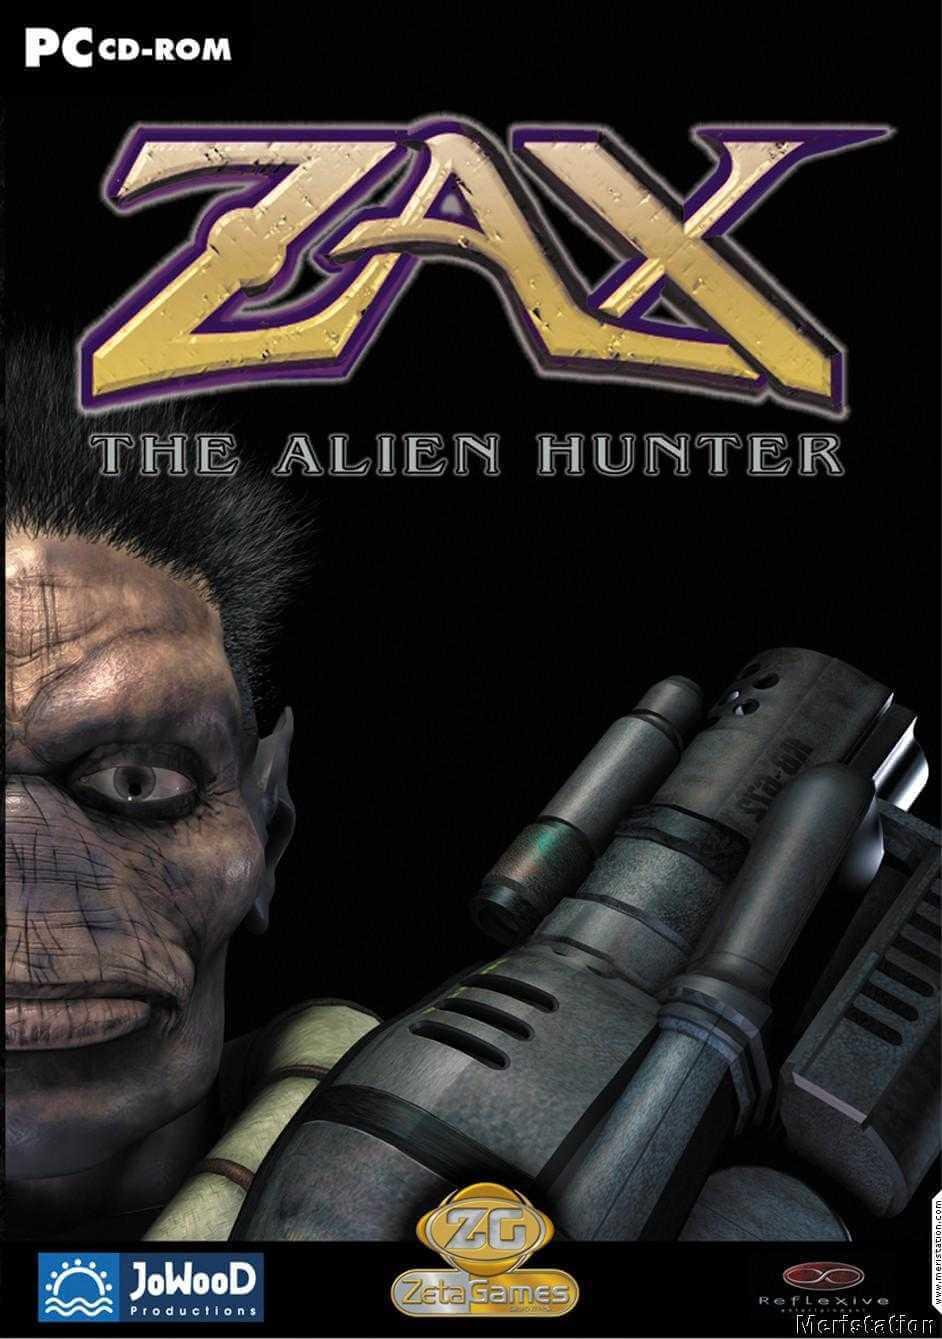 Descargar Zax: The Alien Hunter [PC] [Full] [1-Link] [ISO] Gratis [MEGA]